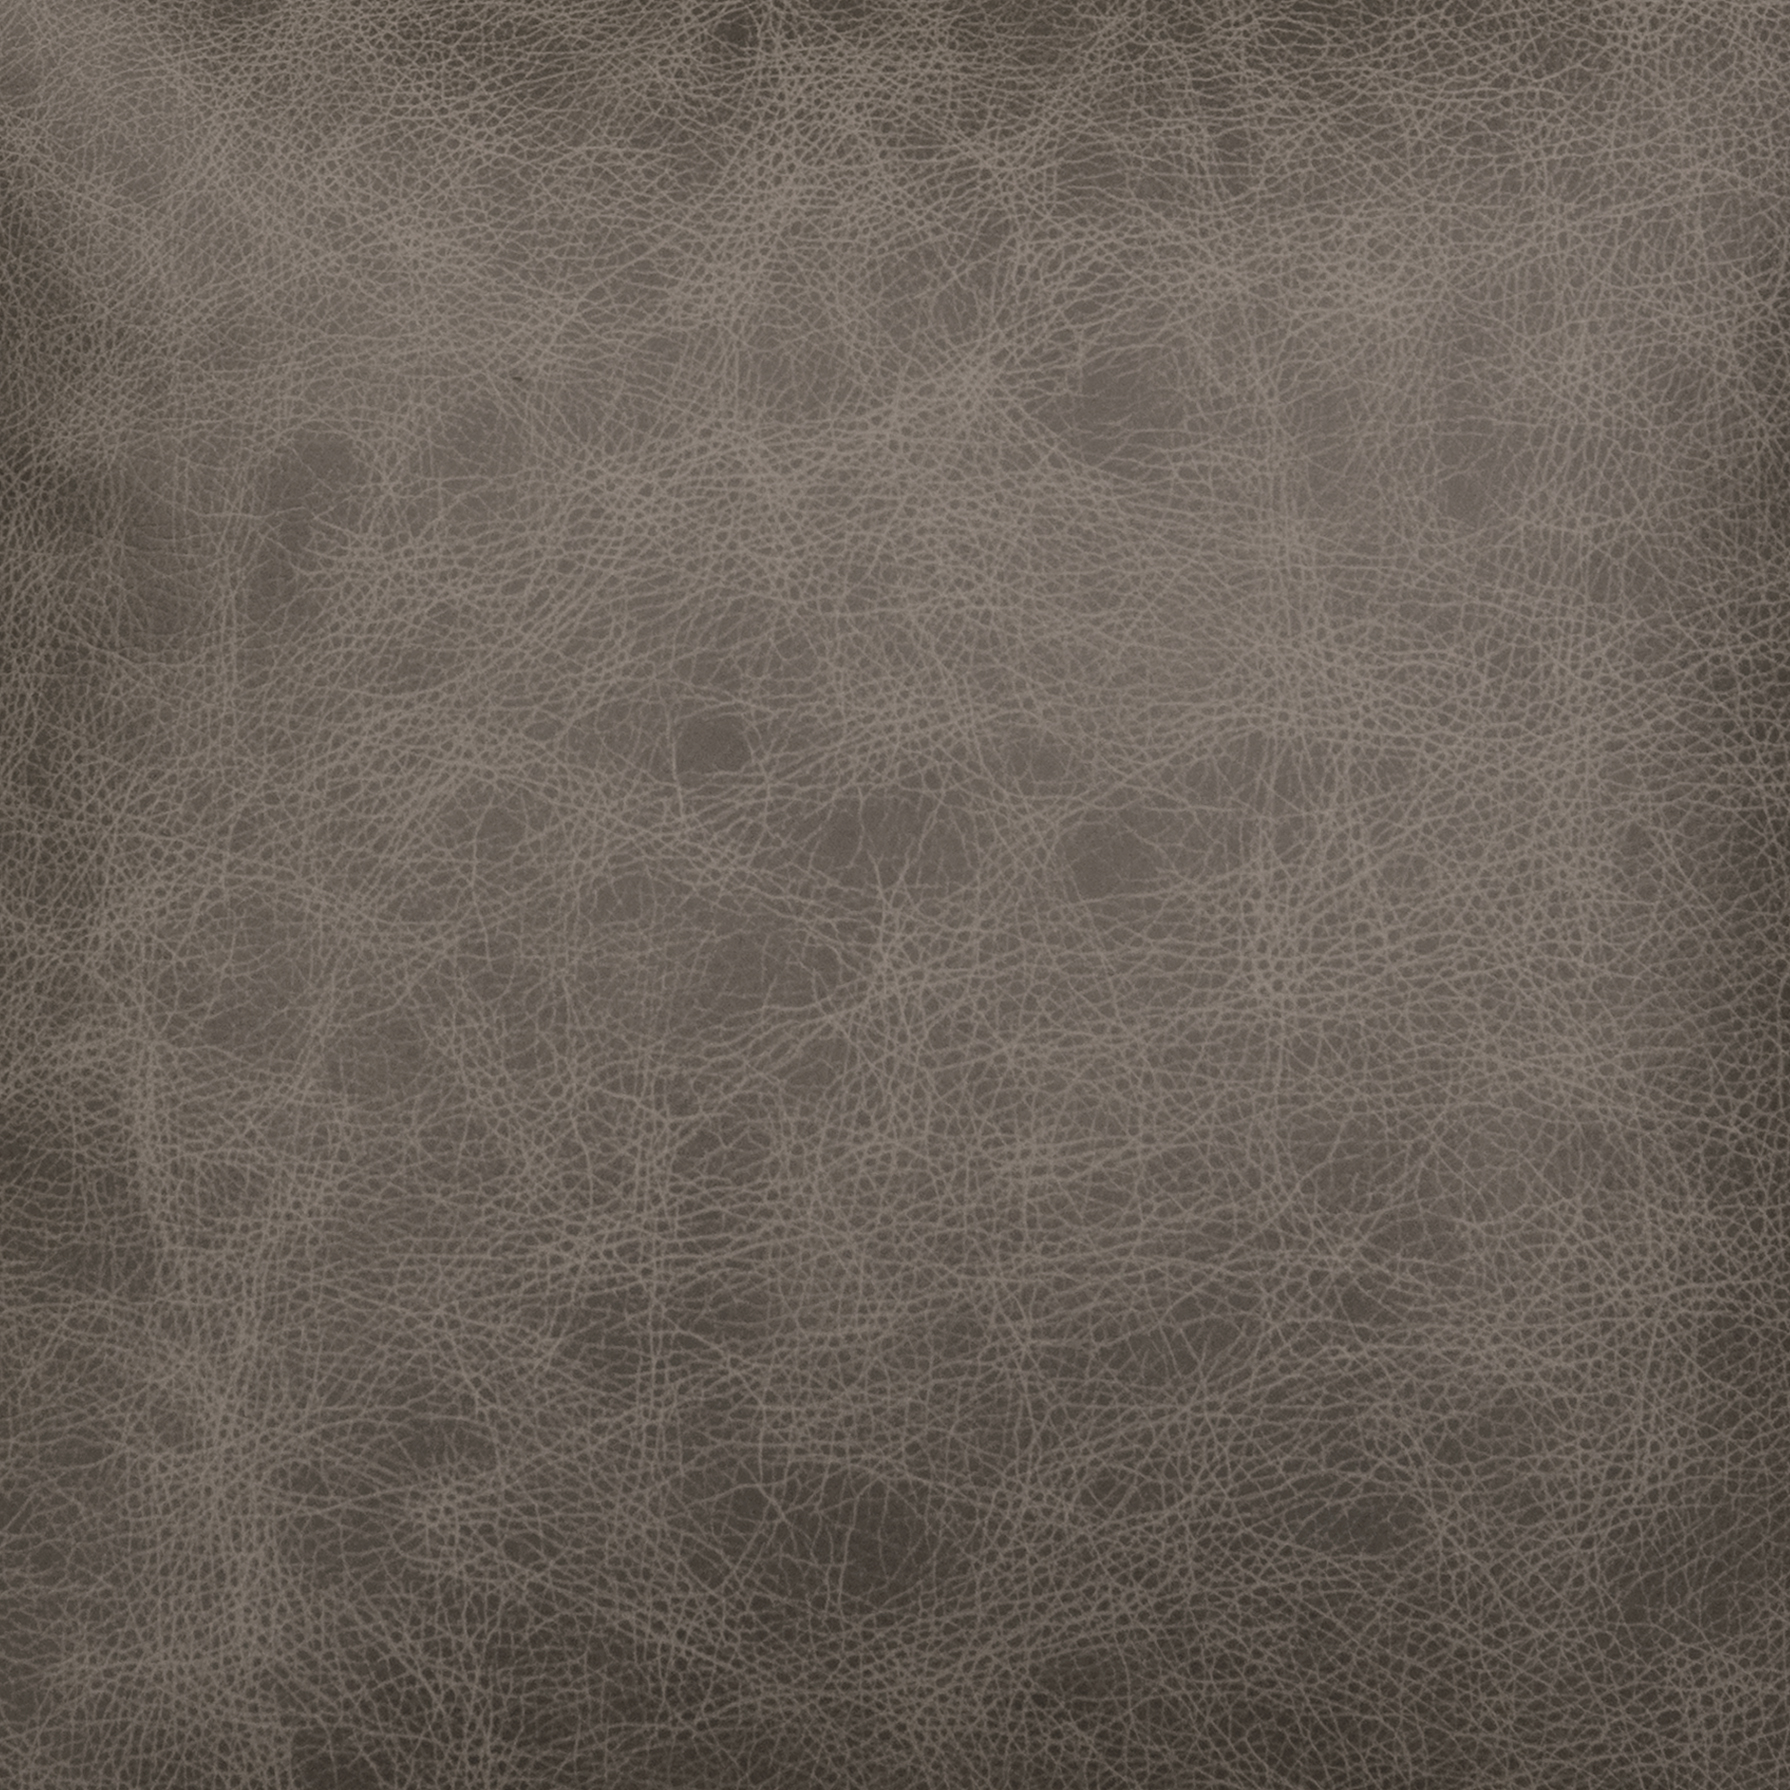 Saloon Grey Leather